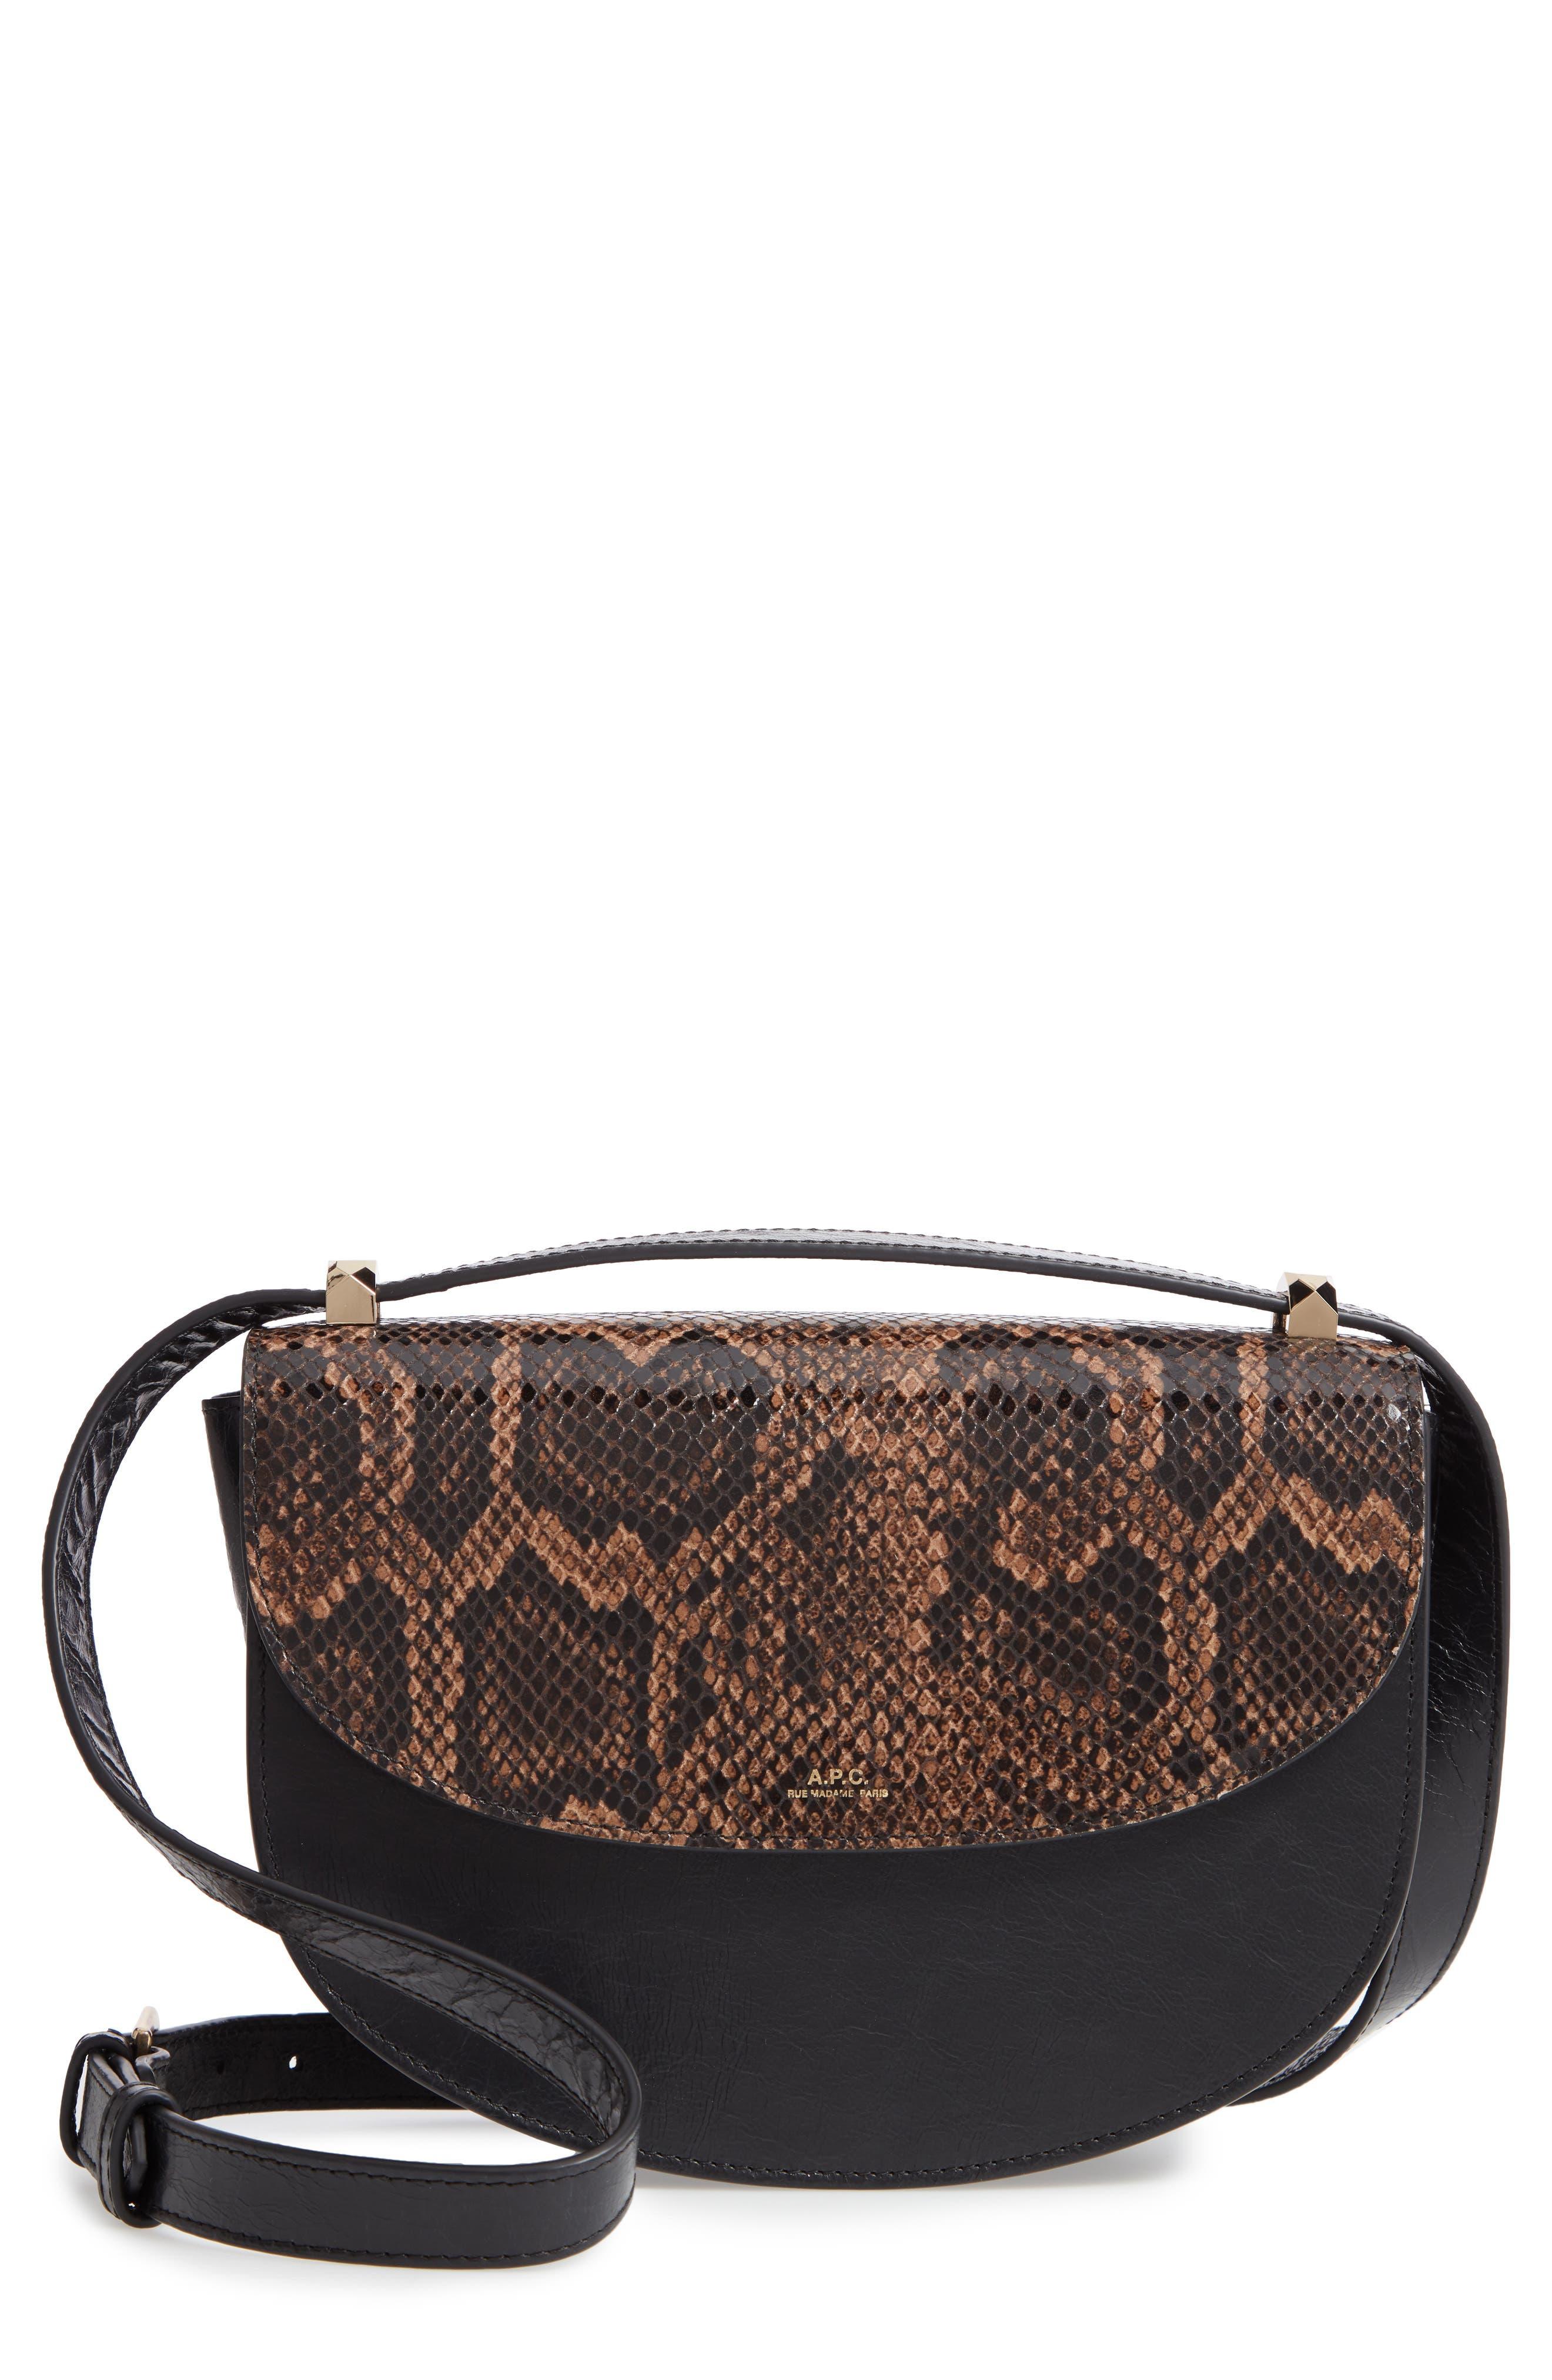 A.P.C., Sac Genève Snake Embossed Leather Shoulder Bag, Main thumbnail 1, color, NOIR